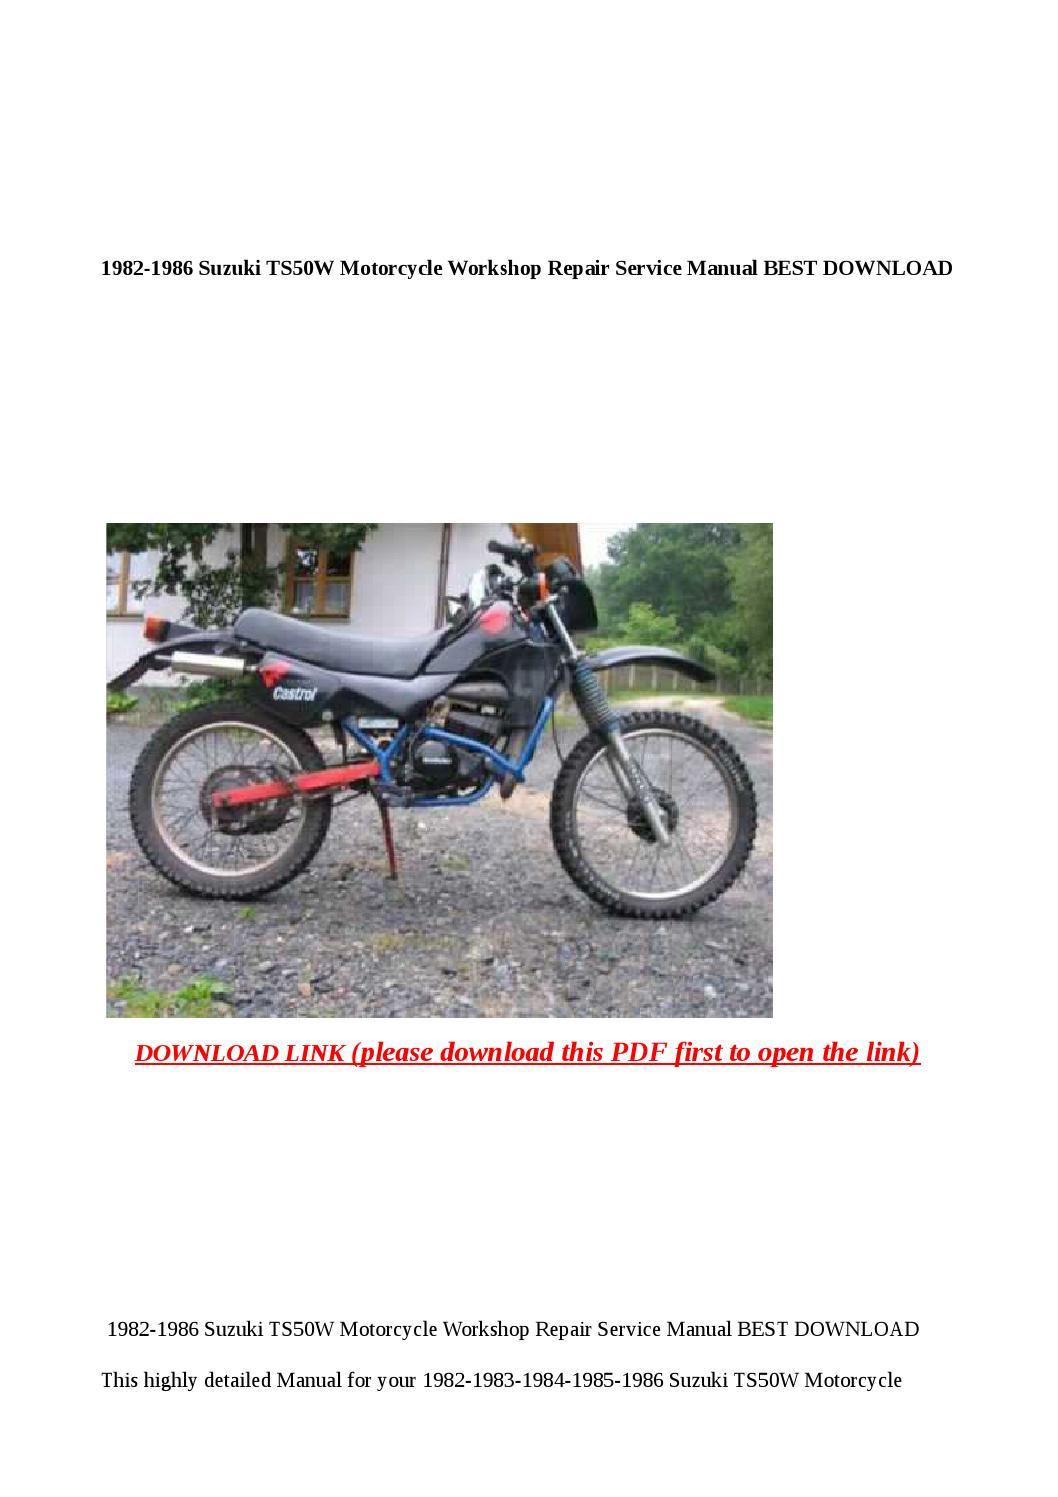 Suzuki outboard manuals free download